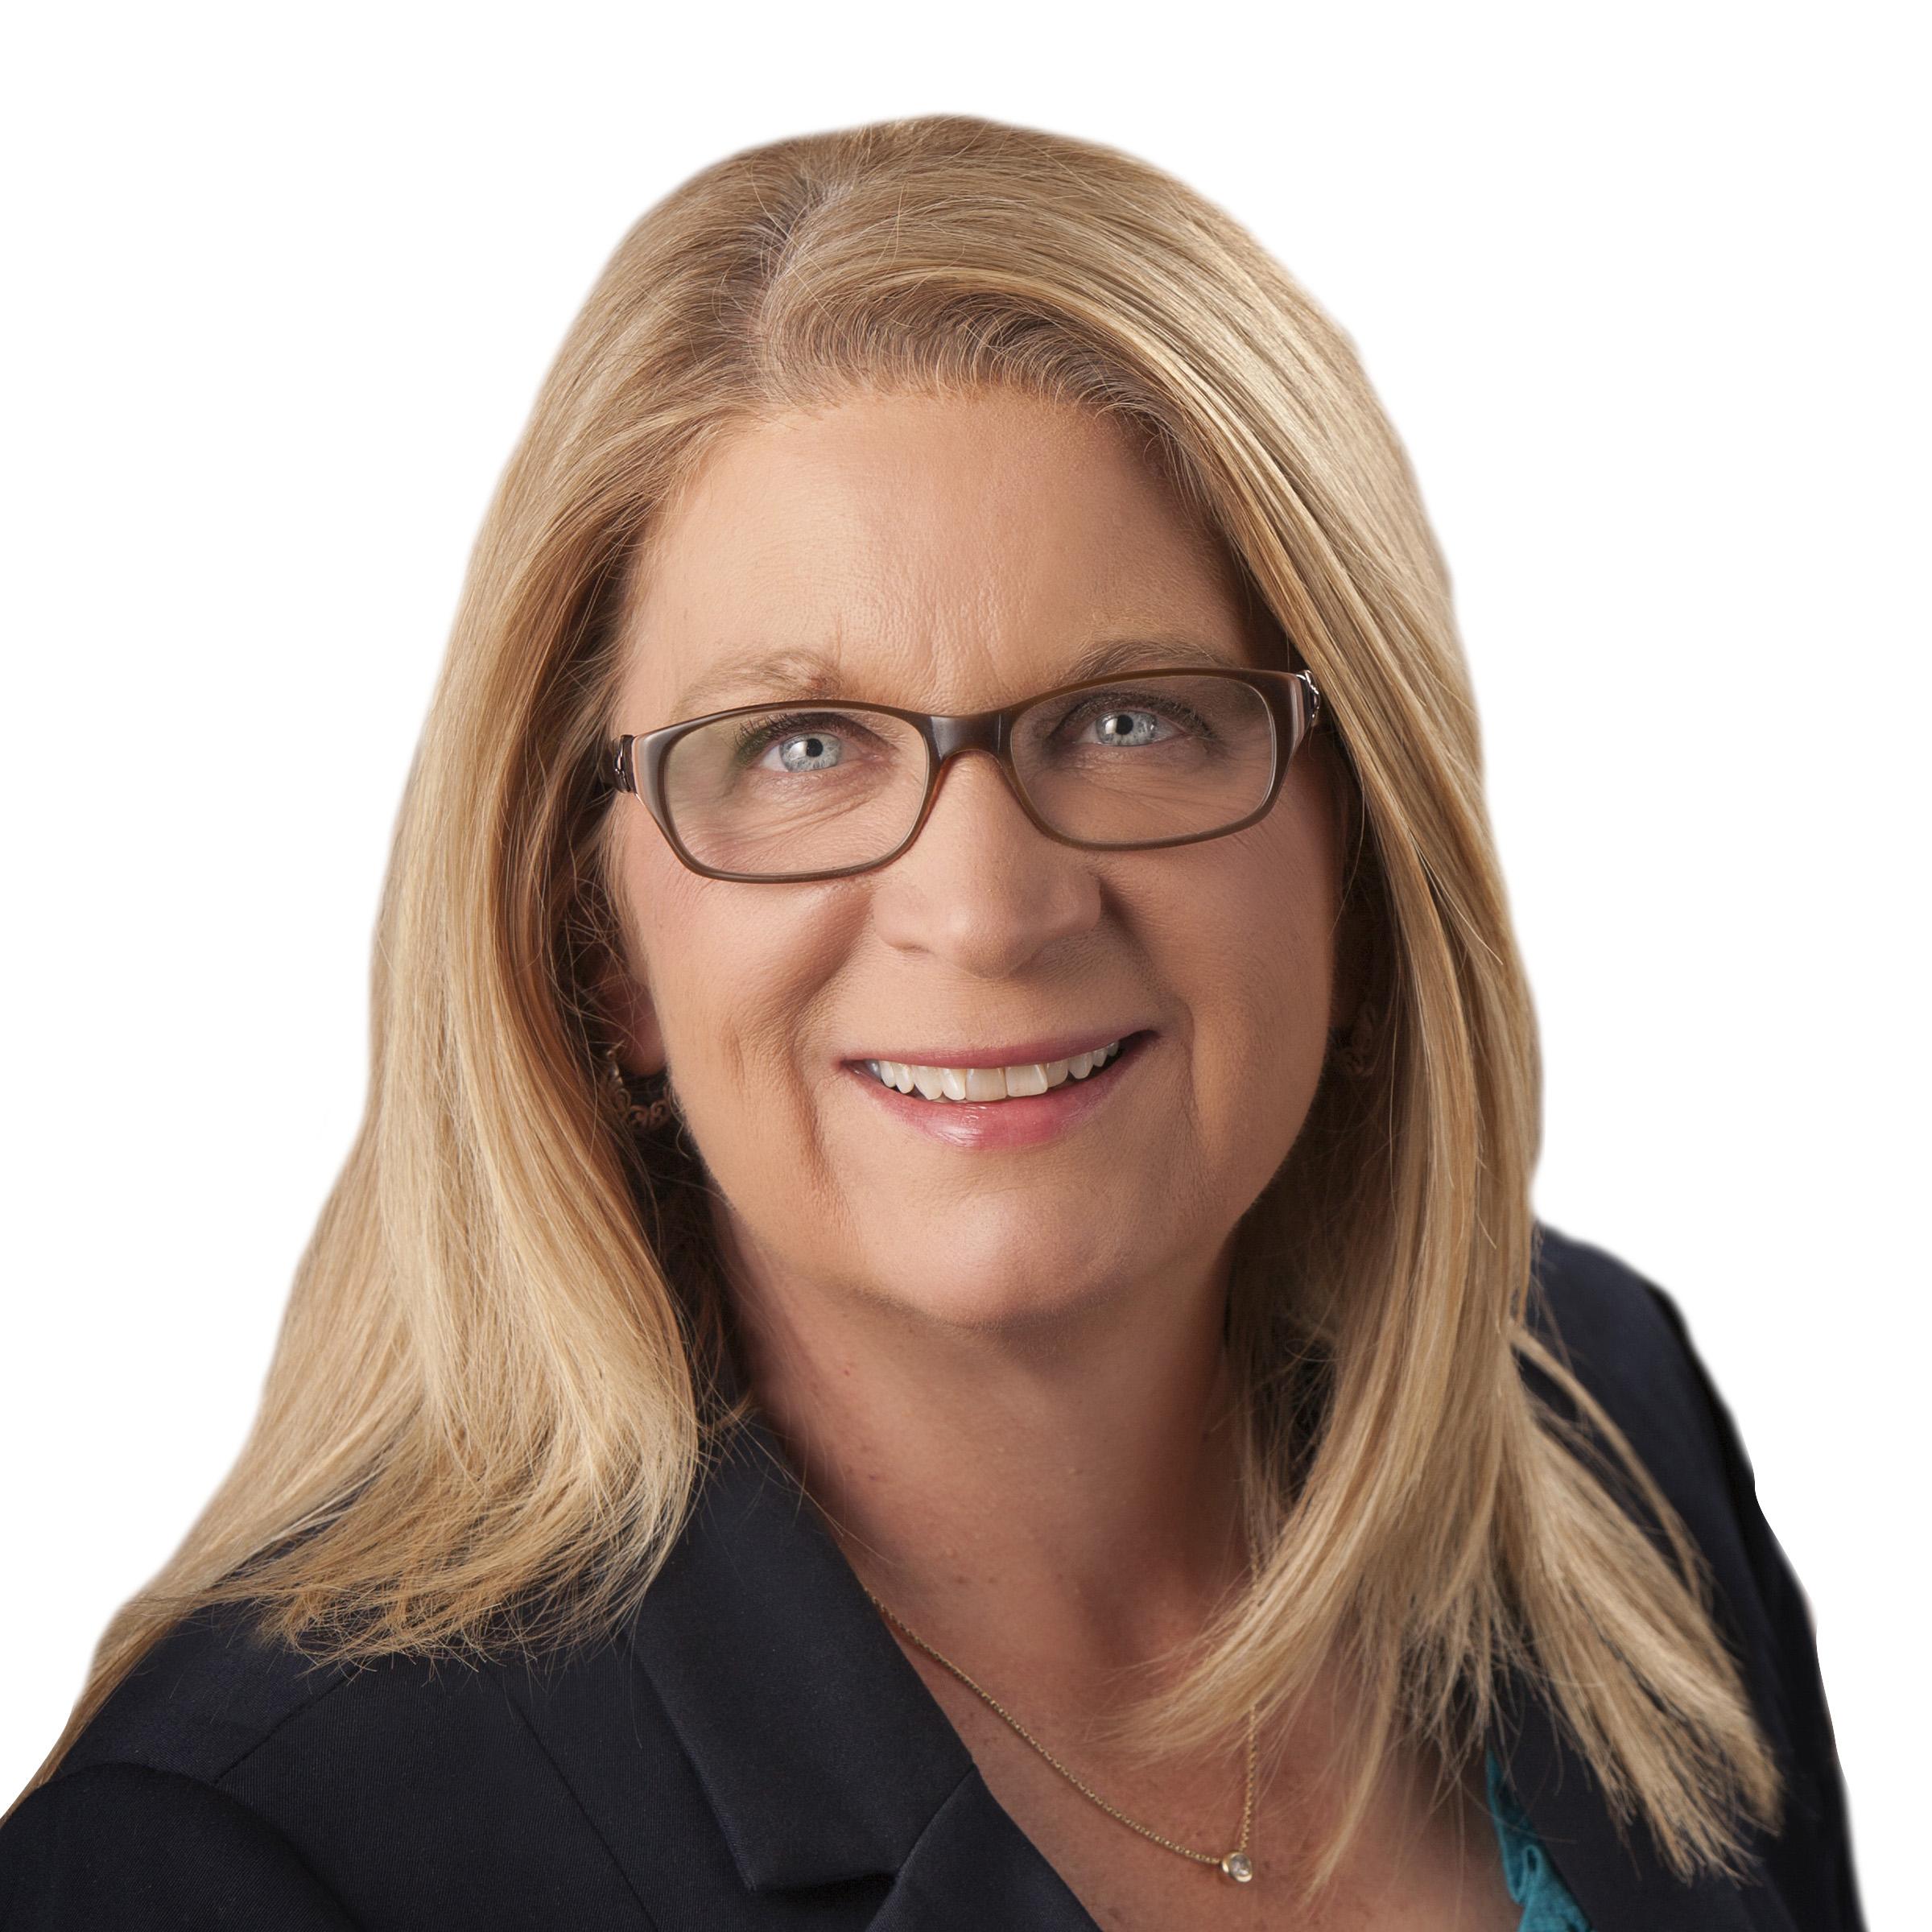 Debra J. Ciskey